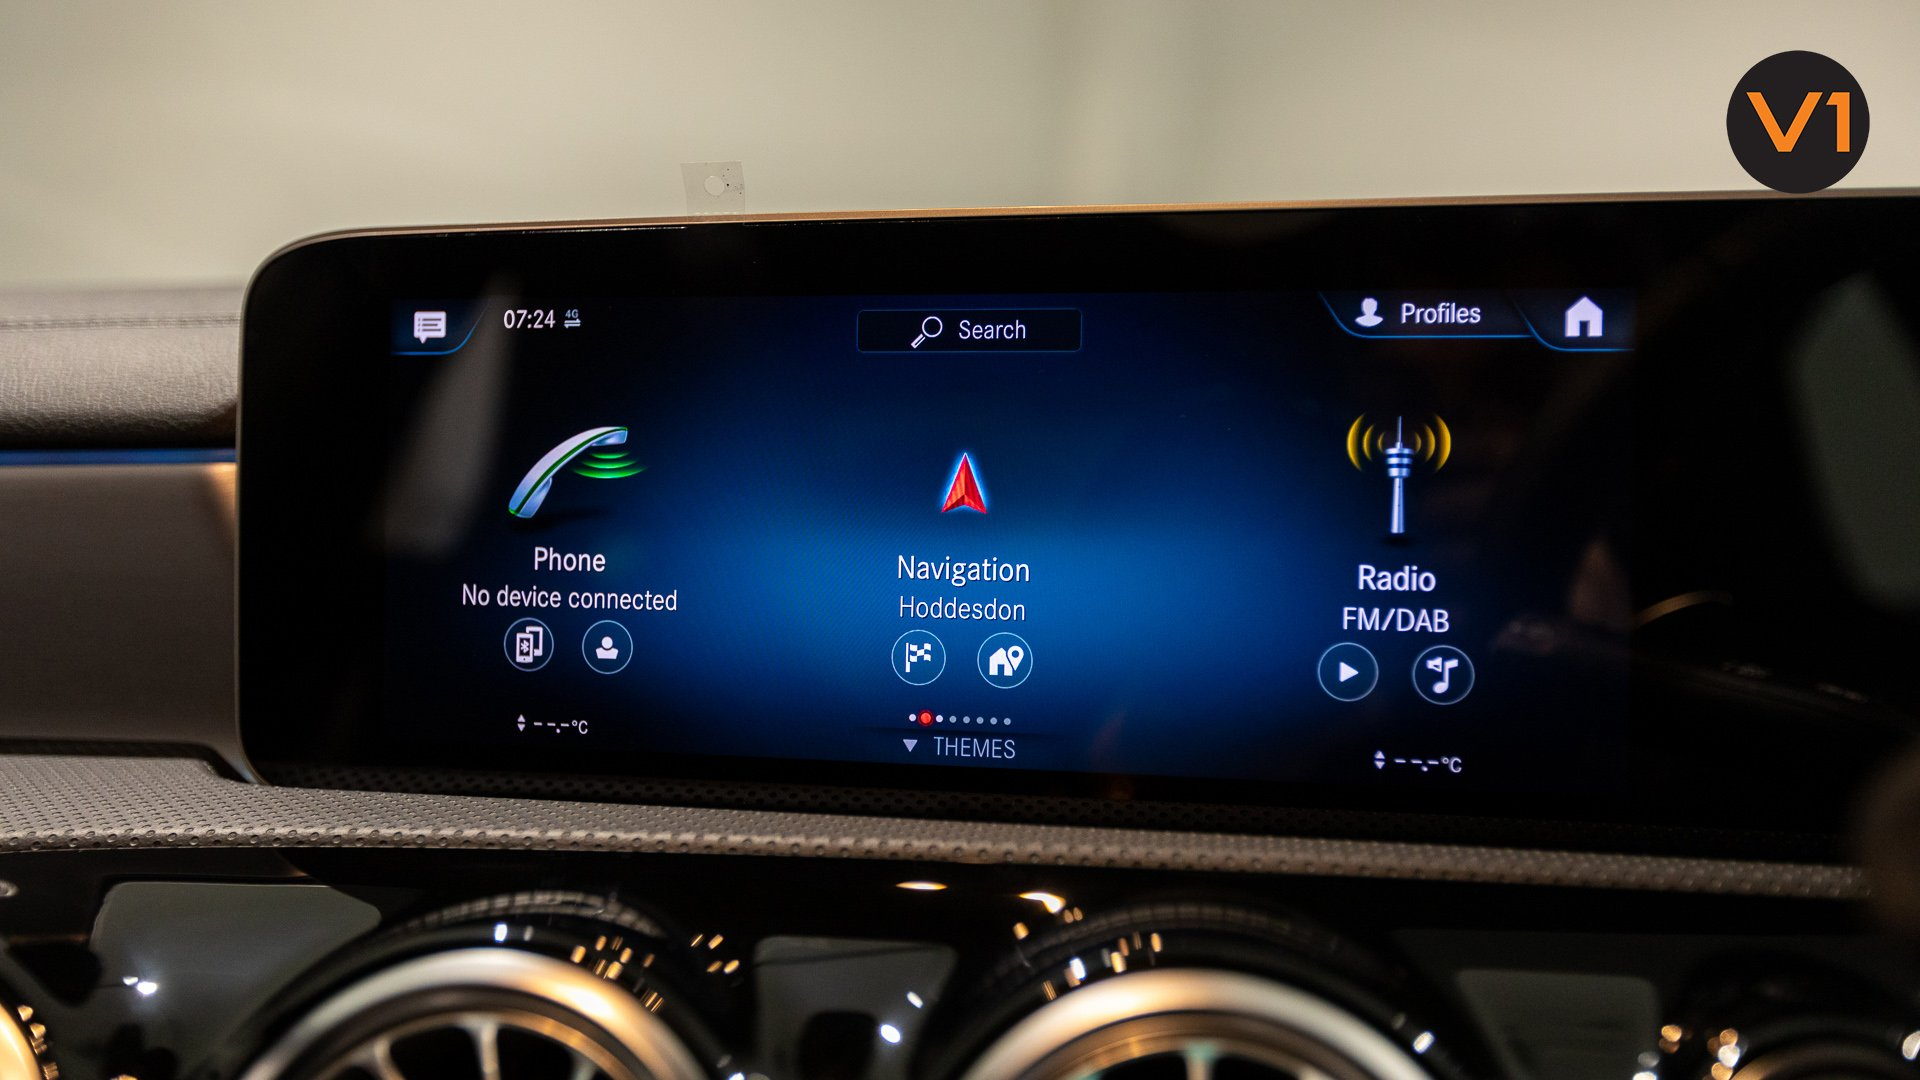 Mercedes-AMG CLA35 Coupe AMG 4Matic Premium Plus - Screen Display